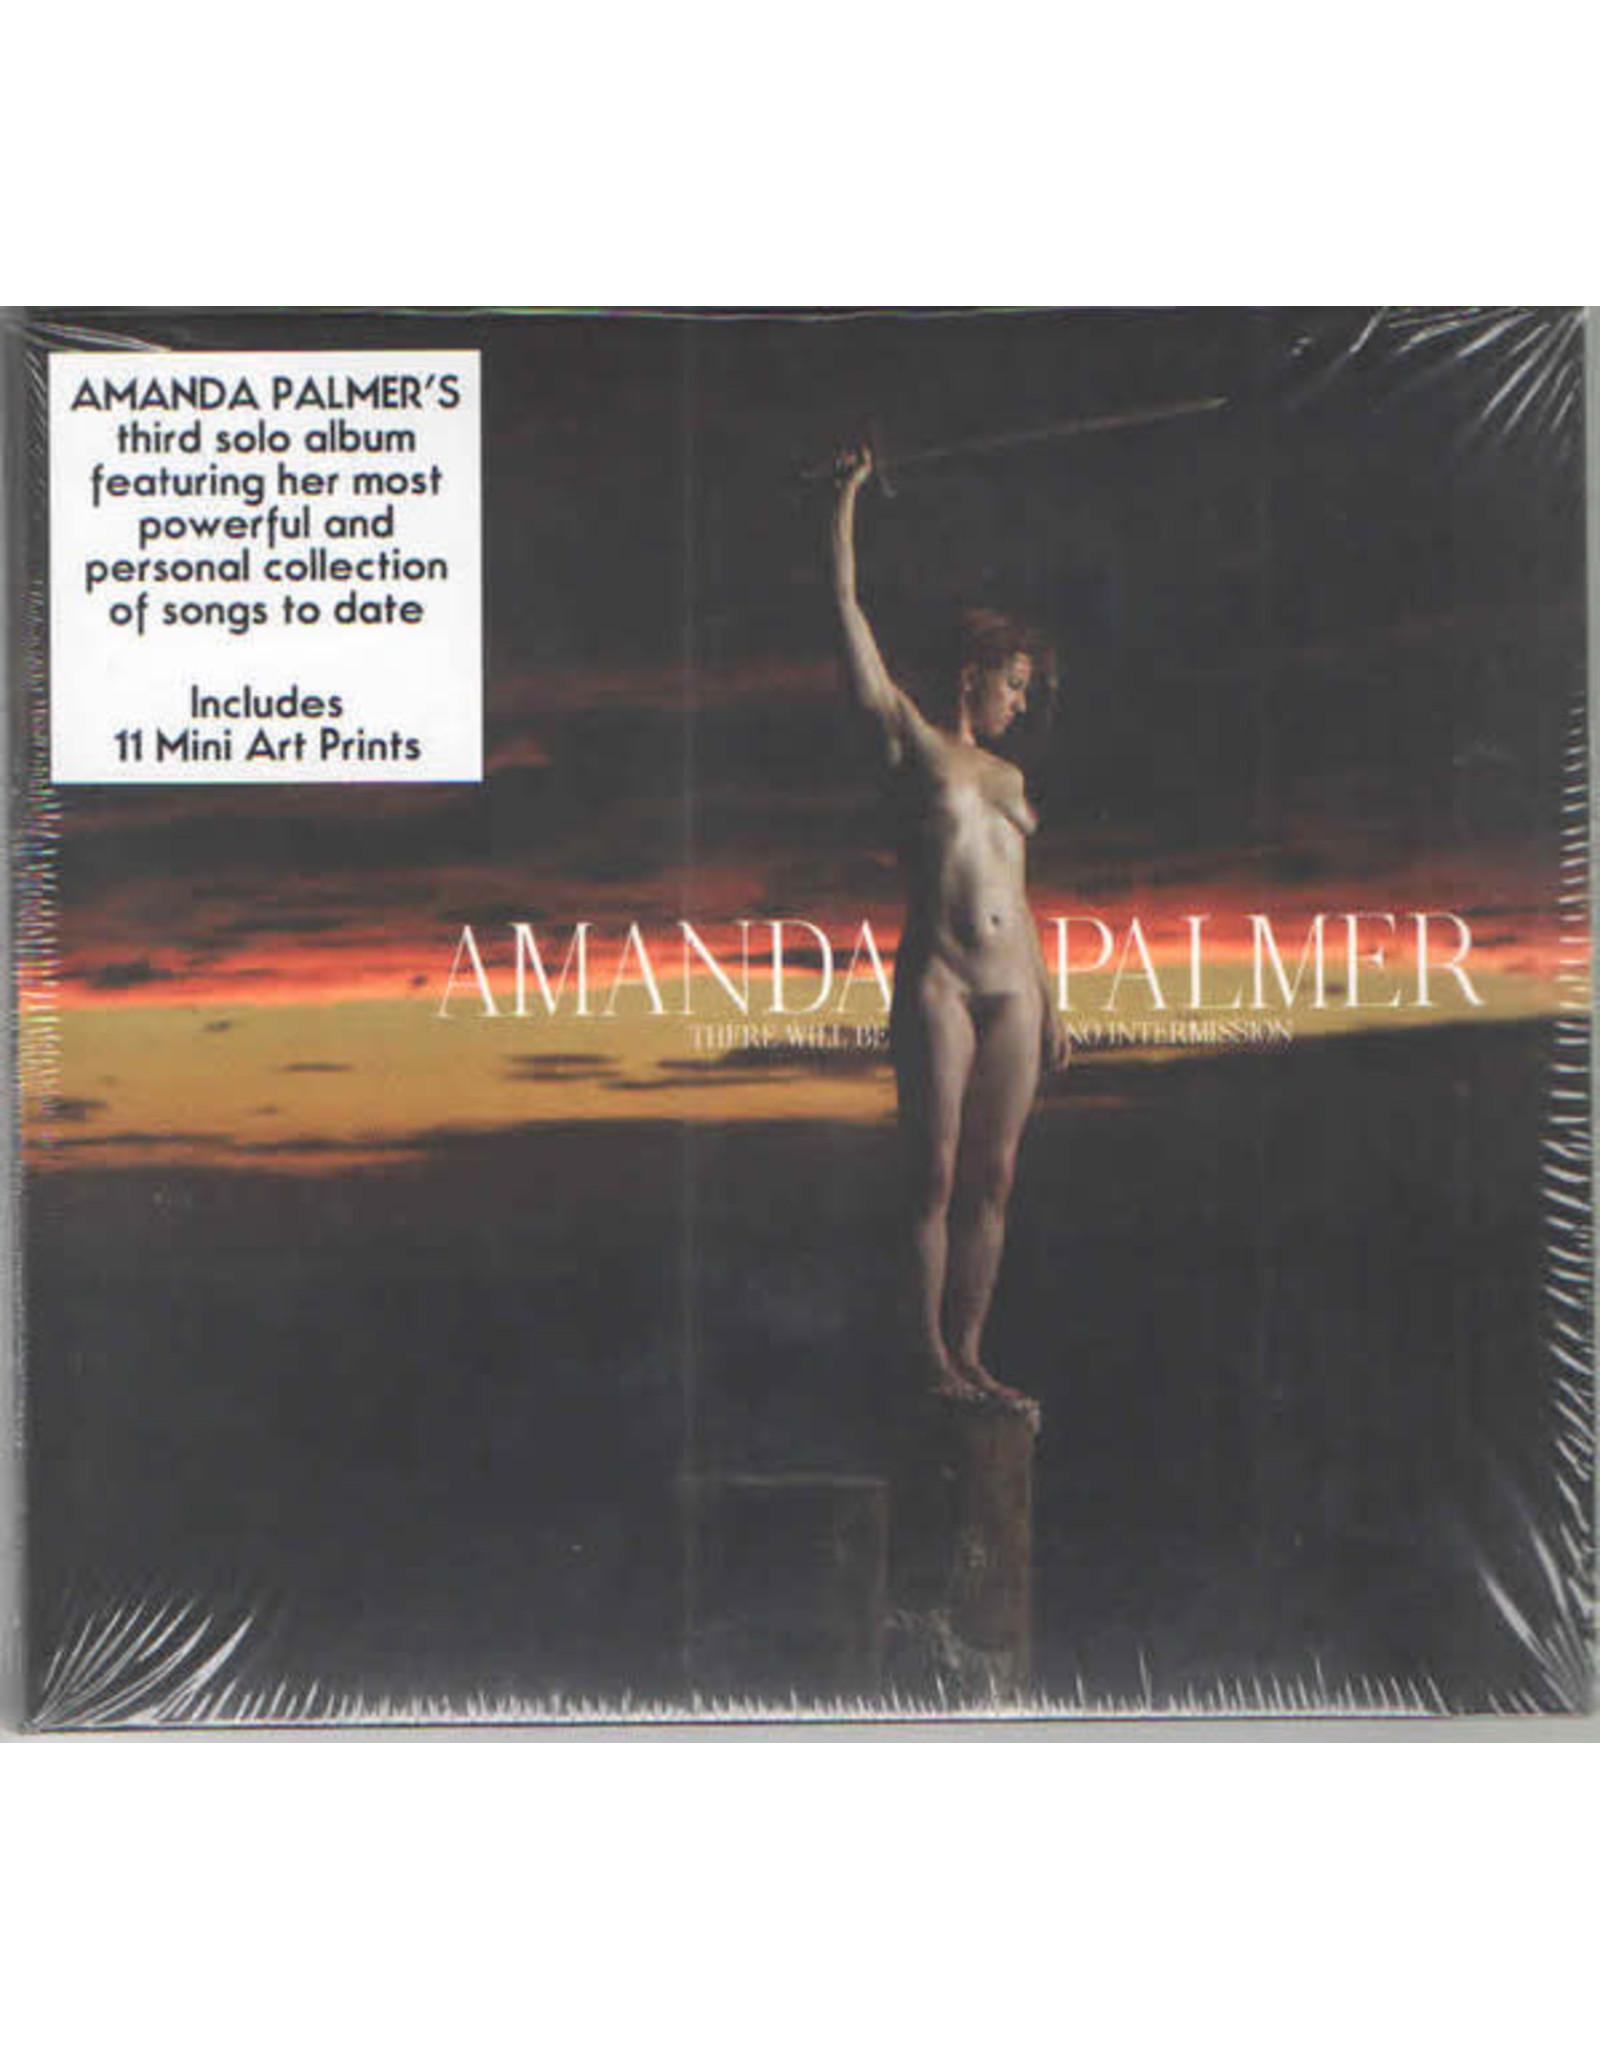 Palmer, Amanda - There Will Be No Intermission CD